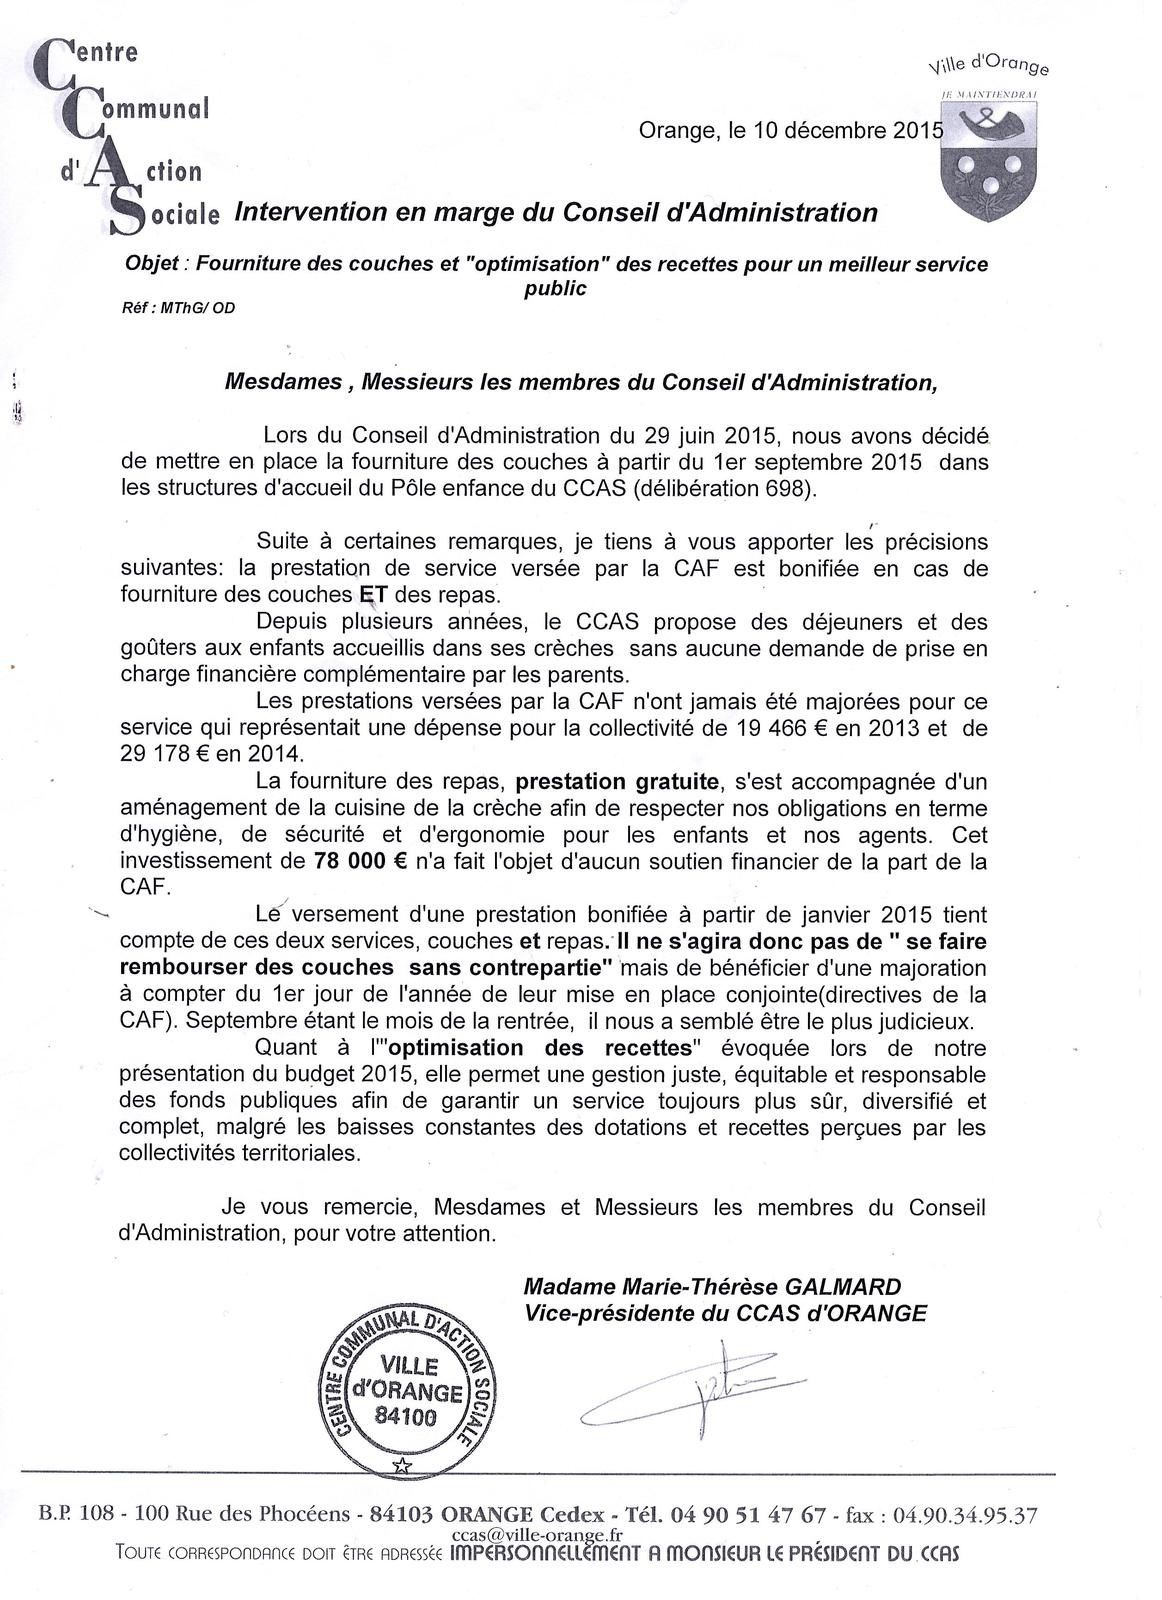 CCAS: La lettre d'explications.